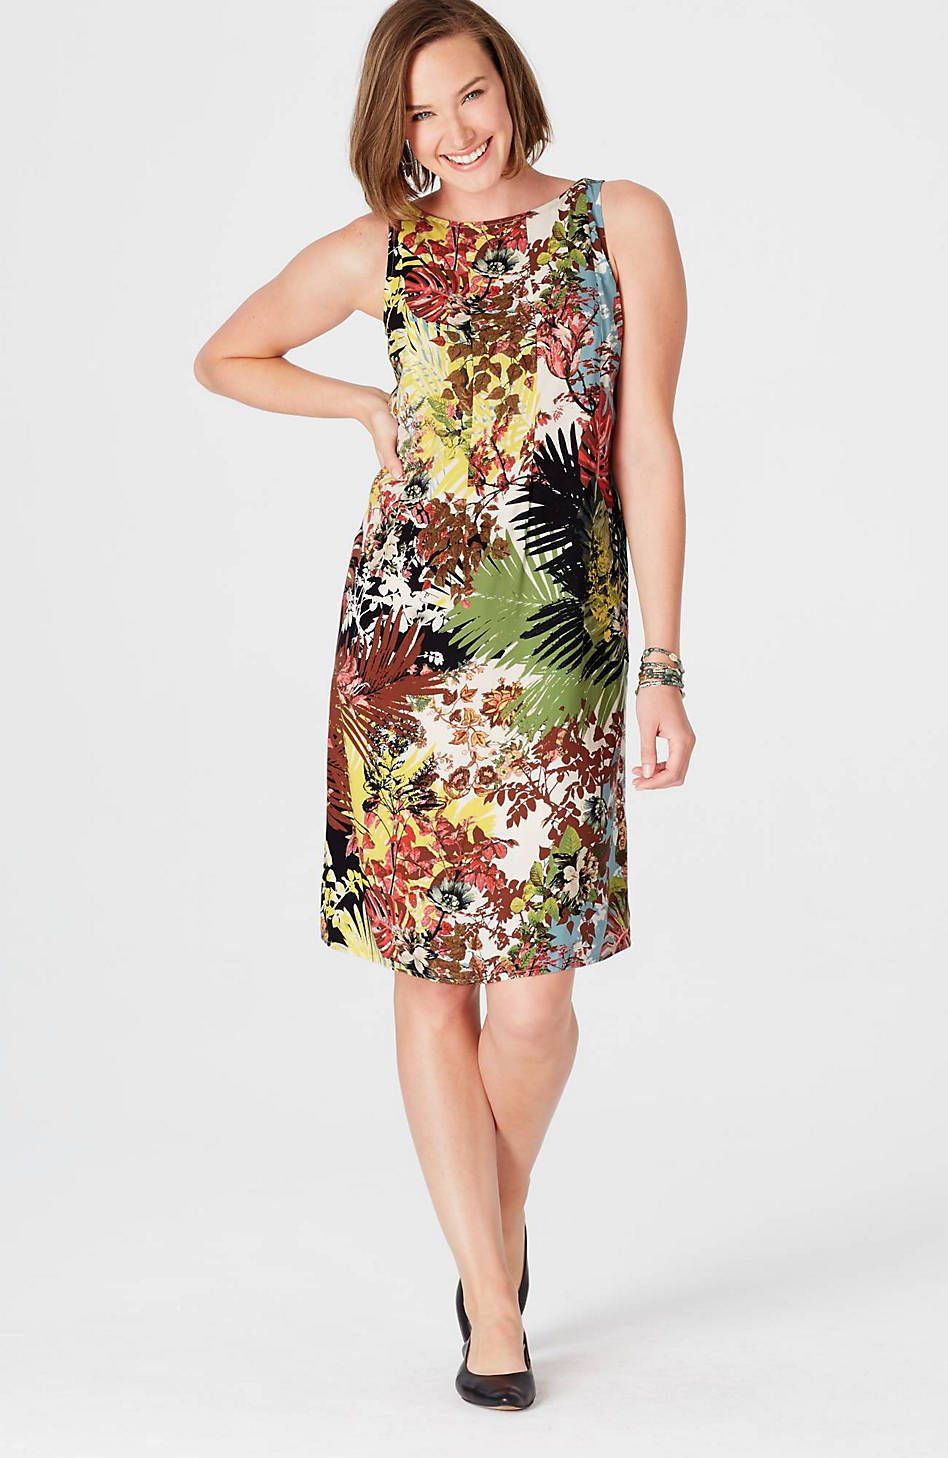 Dresses For Women J Jill Pleated Dress Everyday Dresses Dresses [ 1458 x 948 Pixel ]